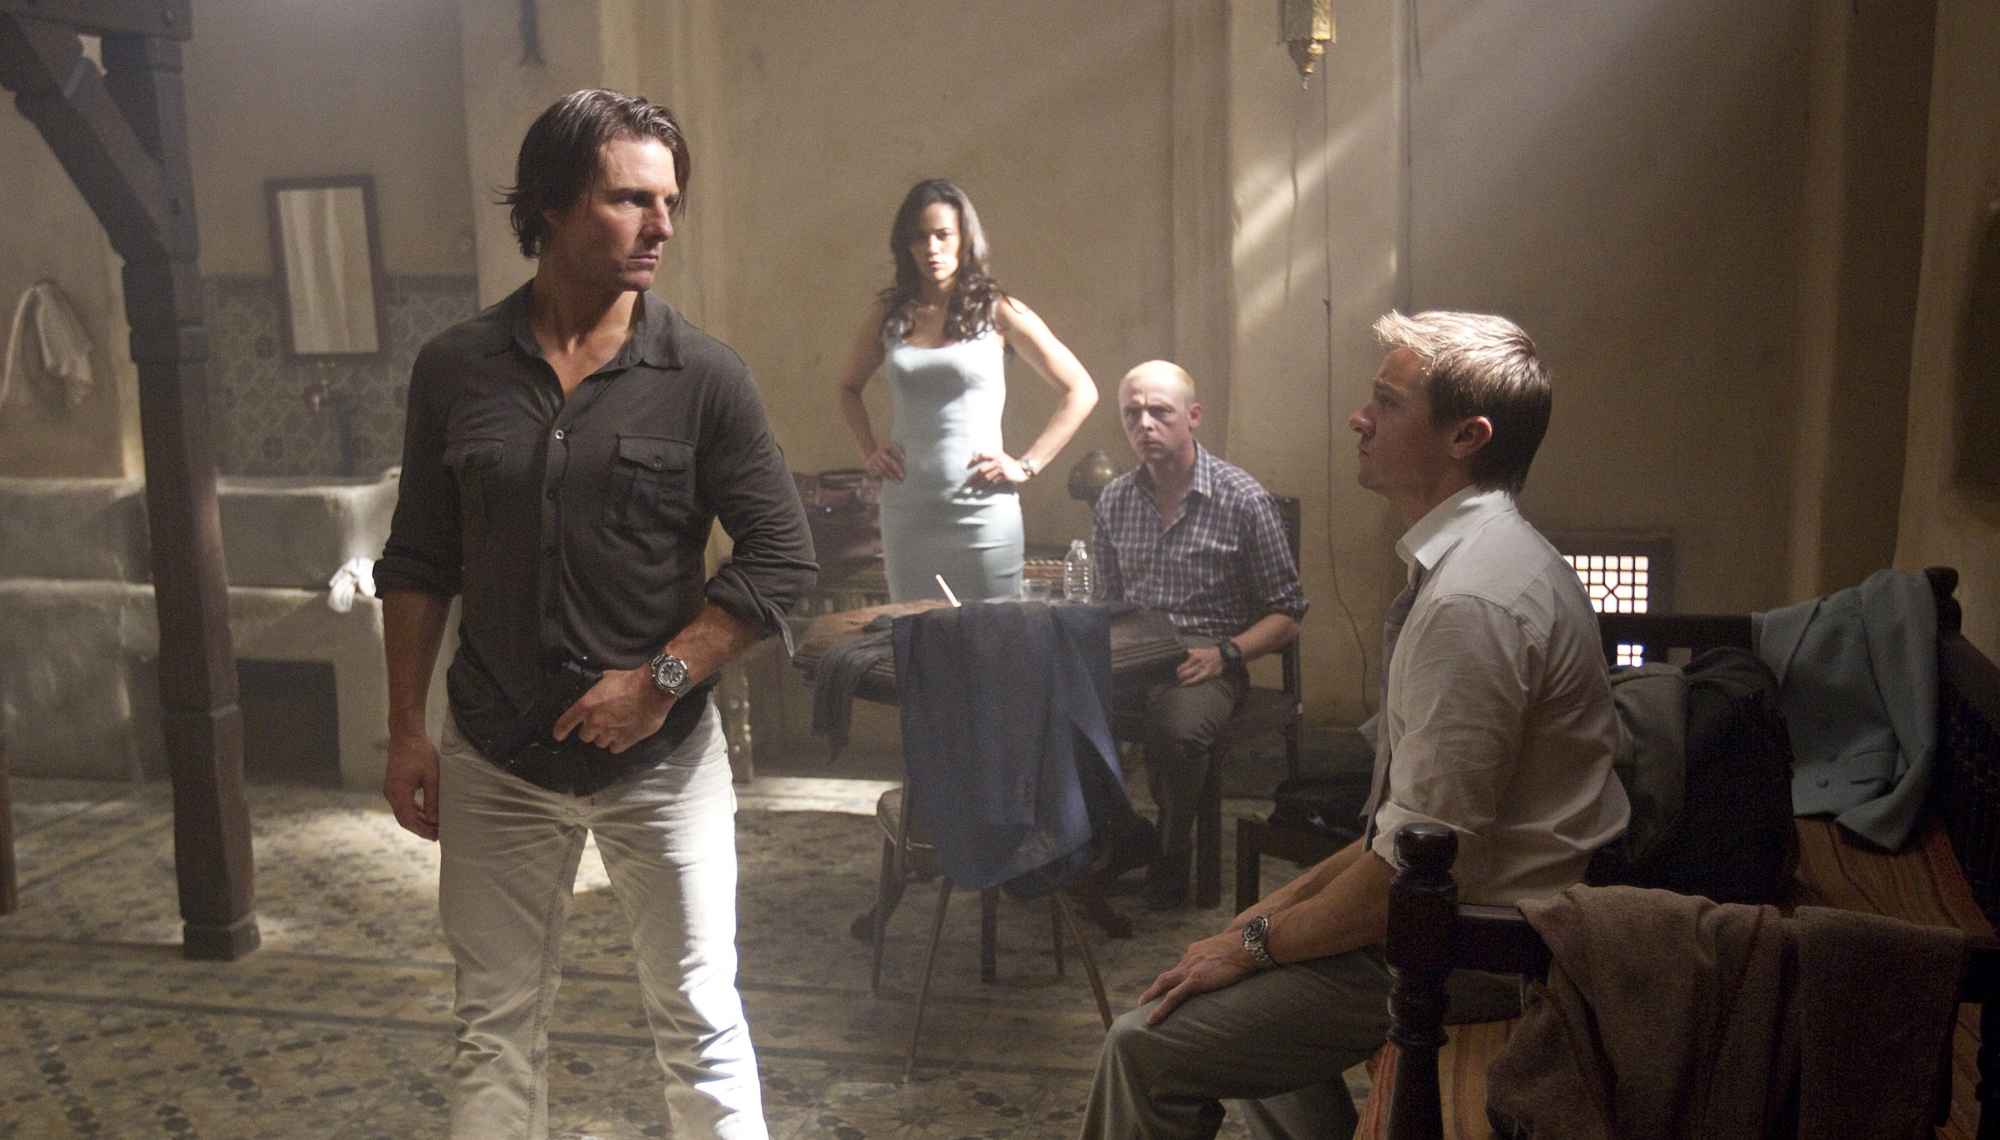 Миссия невыполнима Протокол Фантом (Mission Impossible - Ghost Protocol) эволюция Том Круза в фильмах